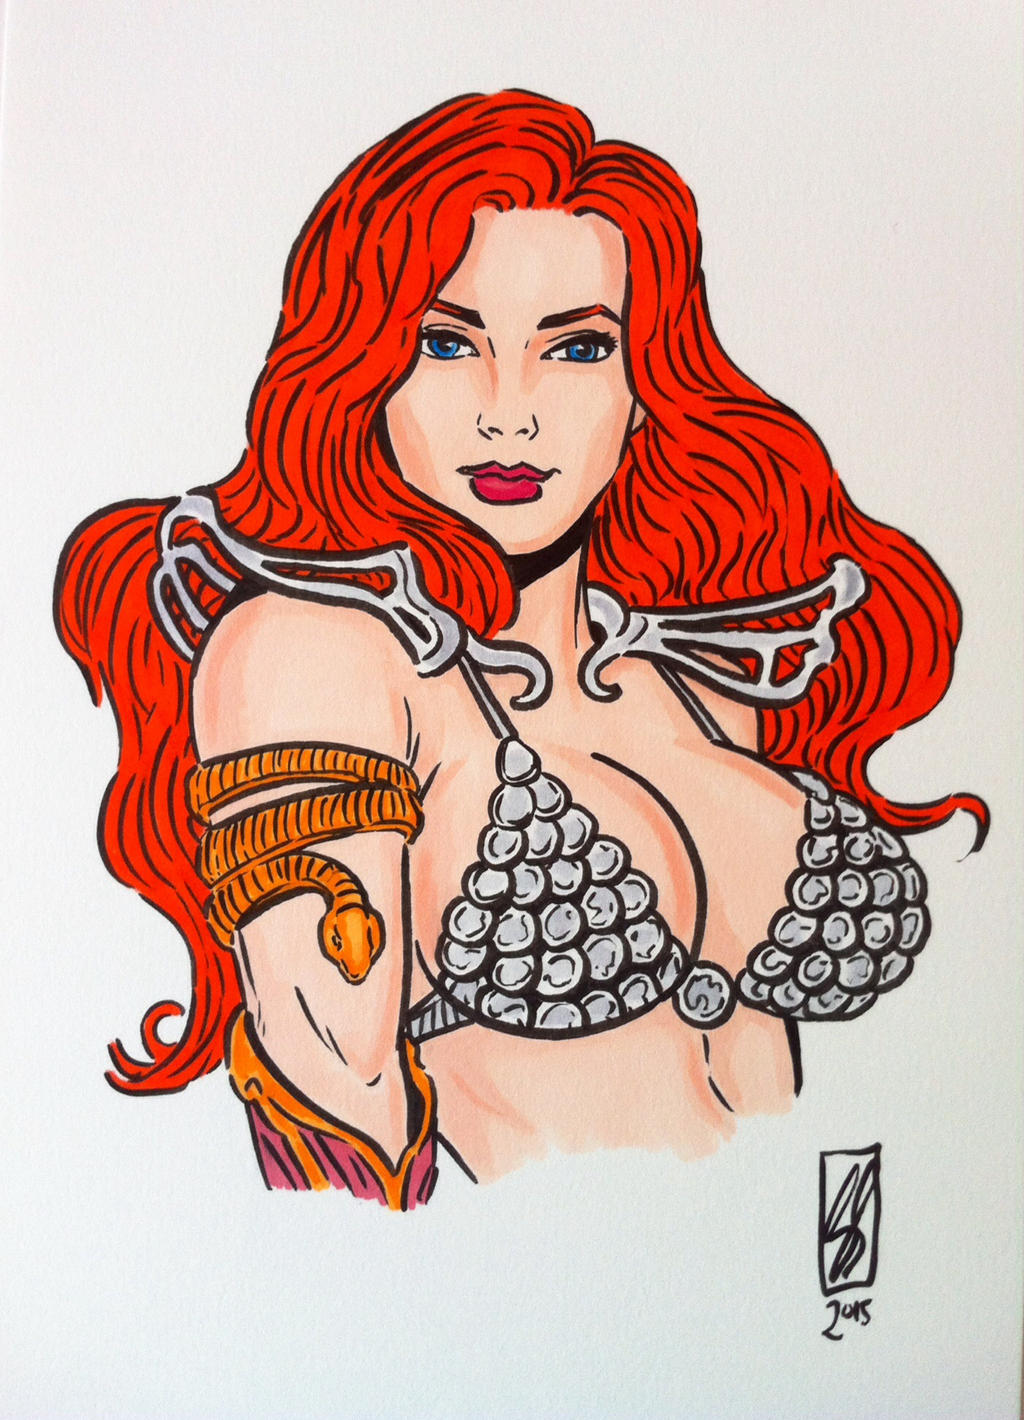 Red Sonja by seanpatrick76